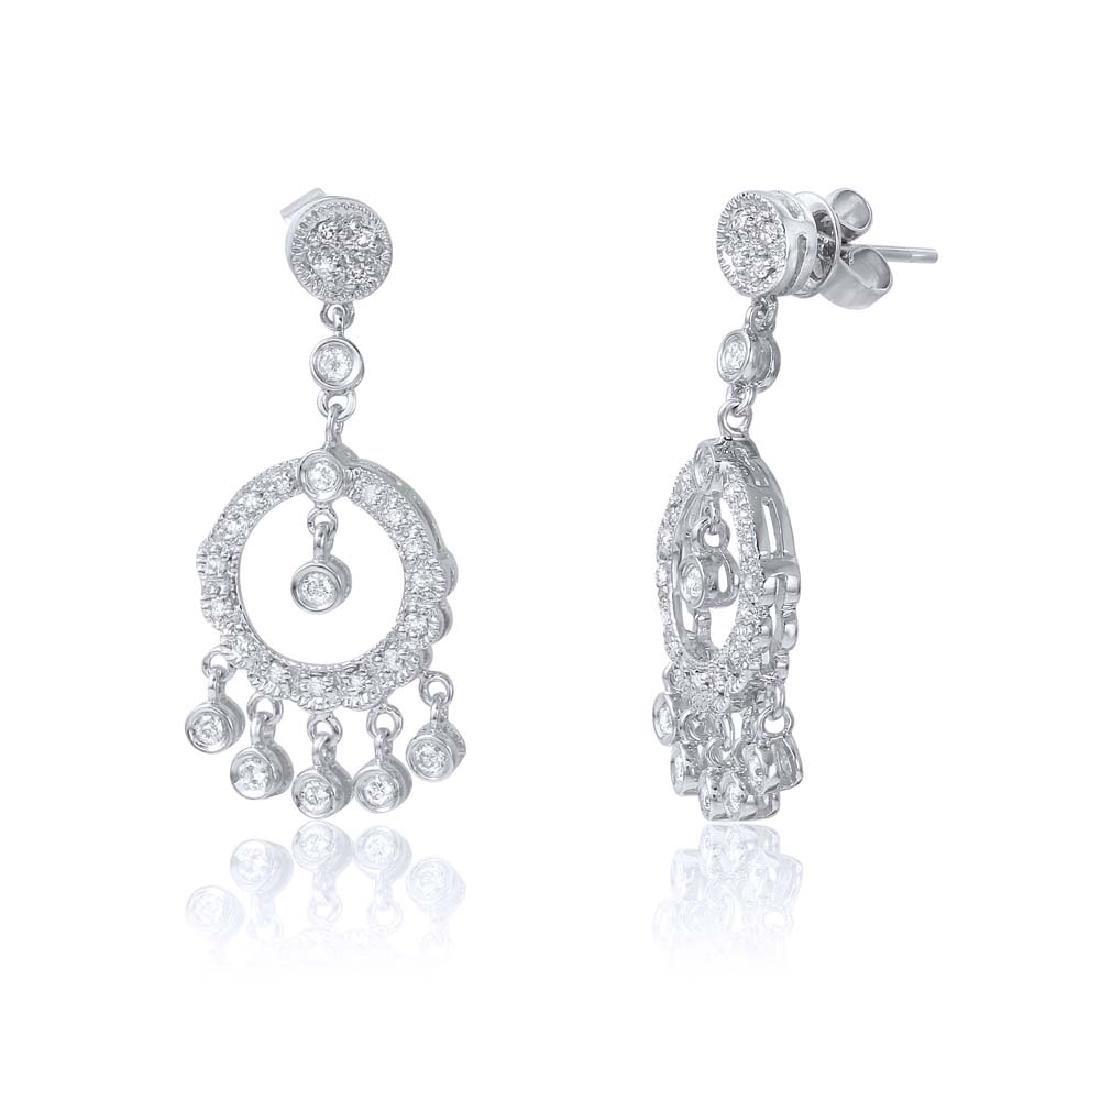 0.6 CTW Diamond Dangling  Earring in 18K White Gold